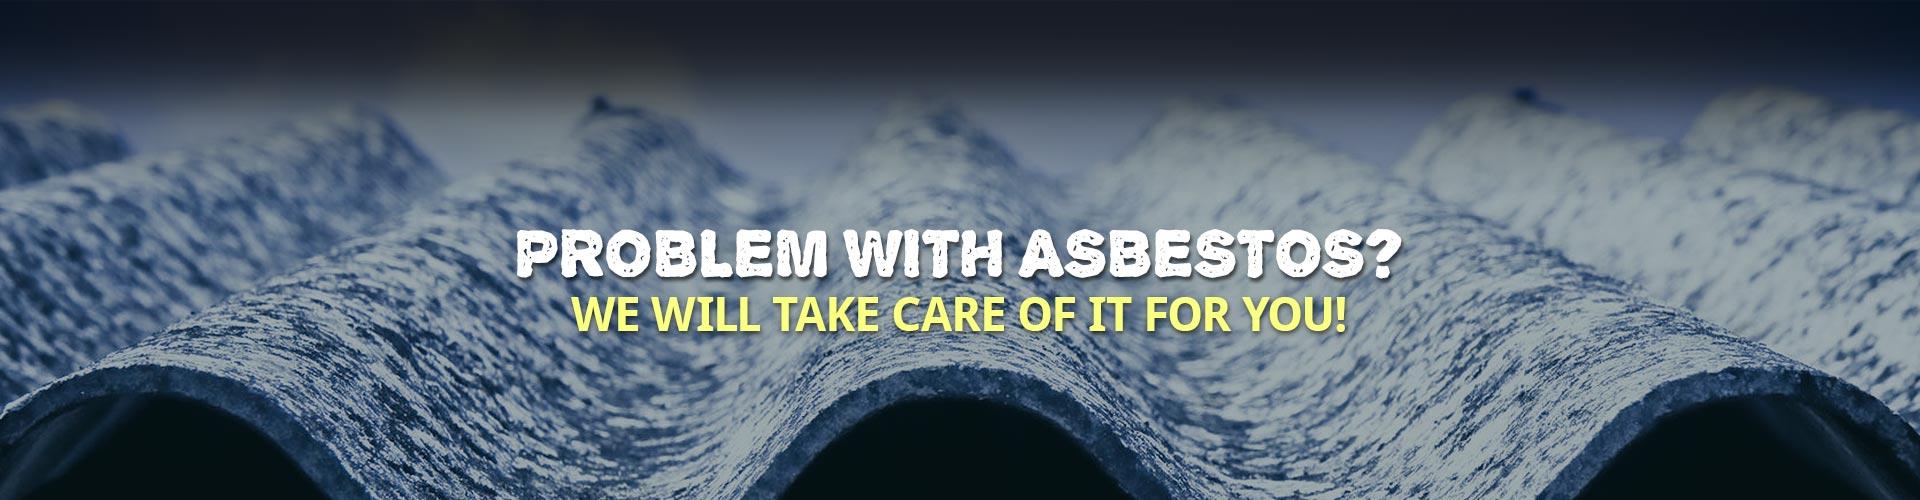 Asbestos Problem Slider